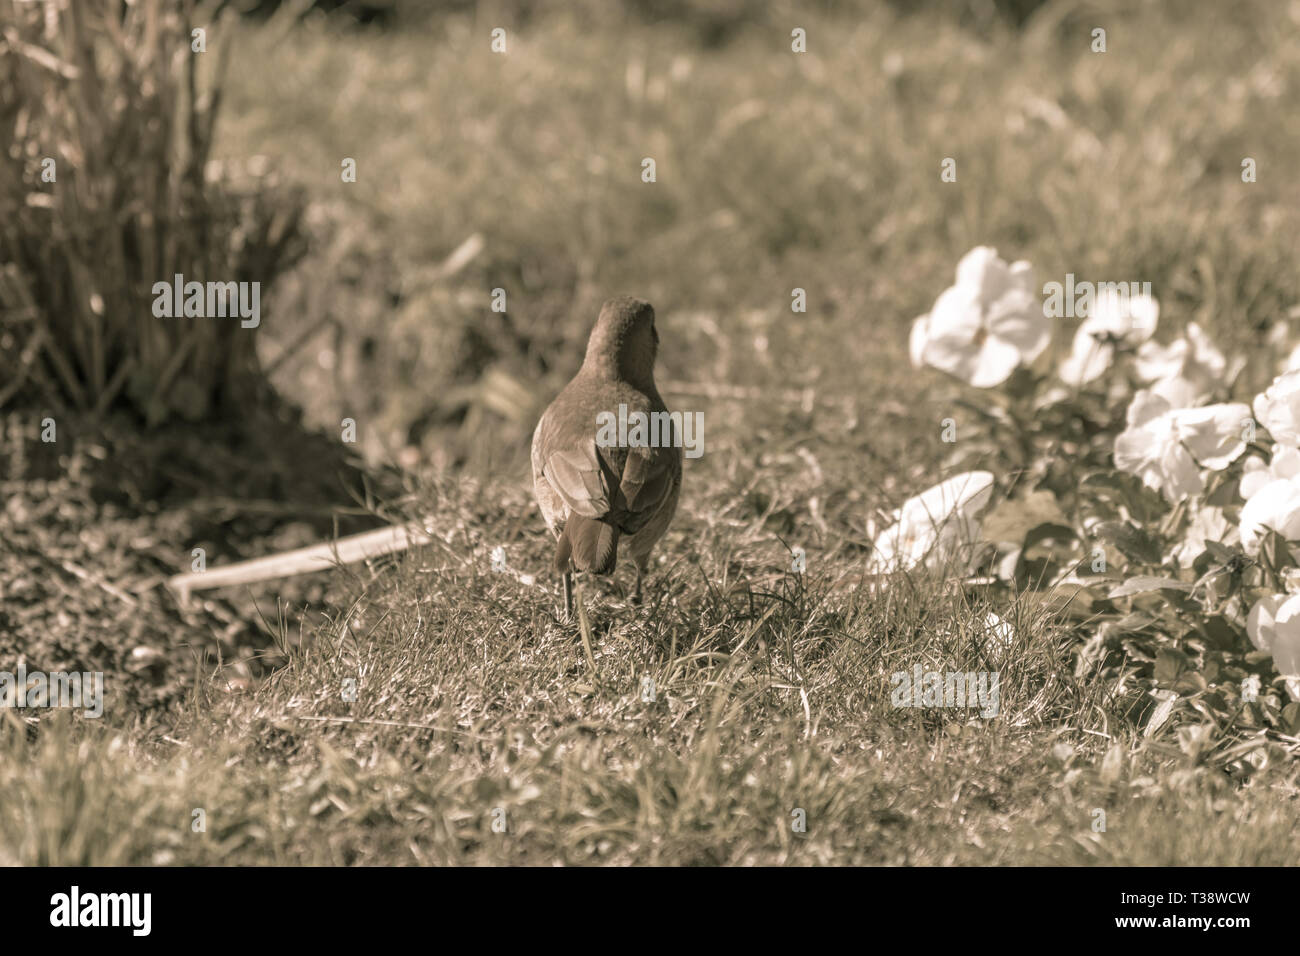 Little bird walking with total freedom in a park. Photograph taken in Punta del Este, Uruguay. - Stock Image